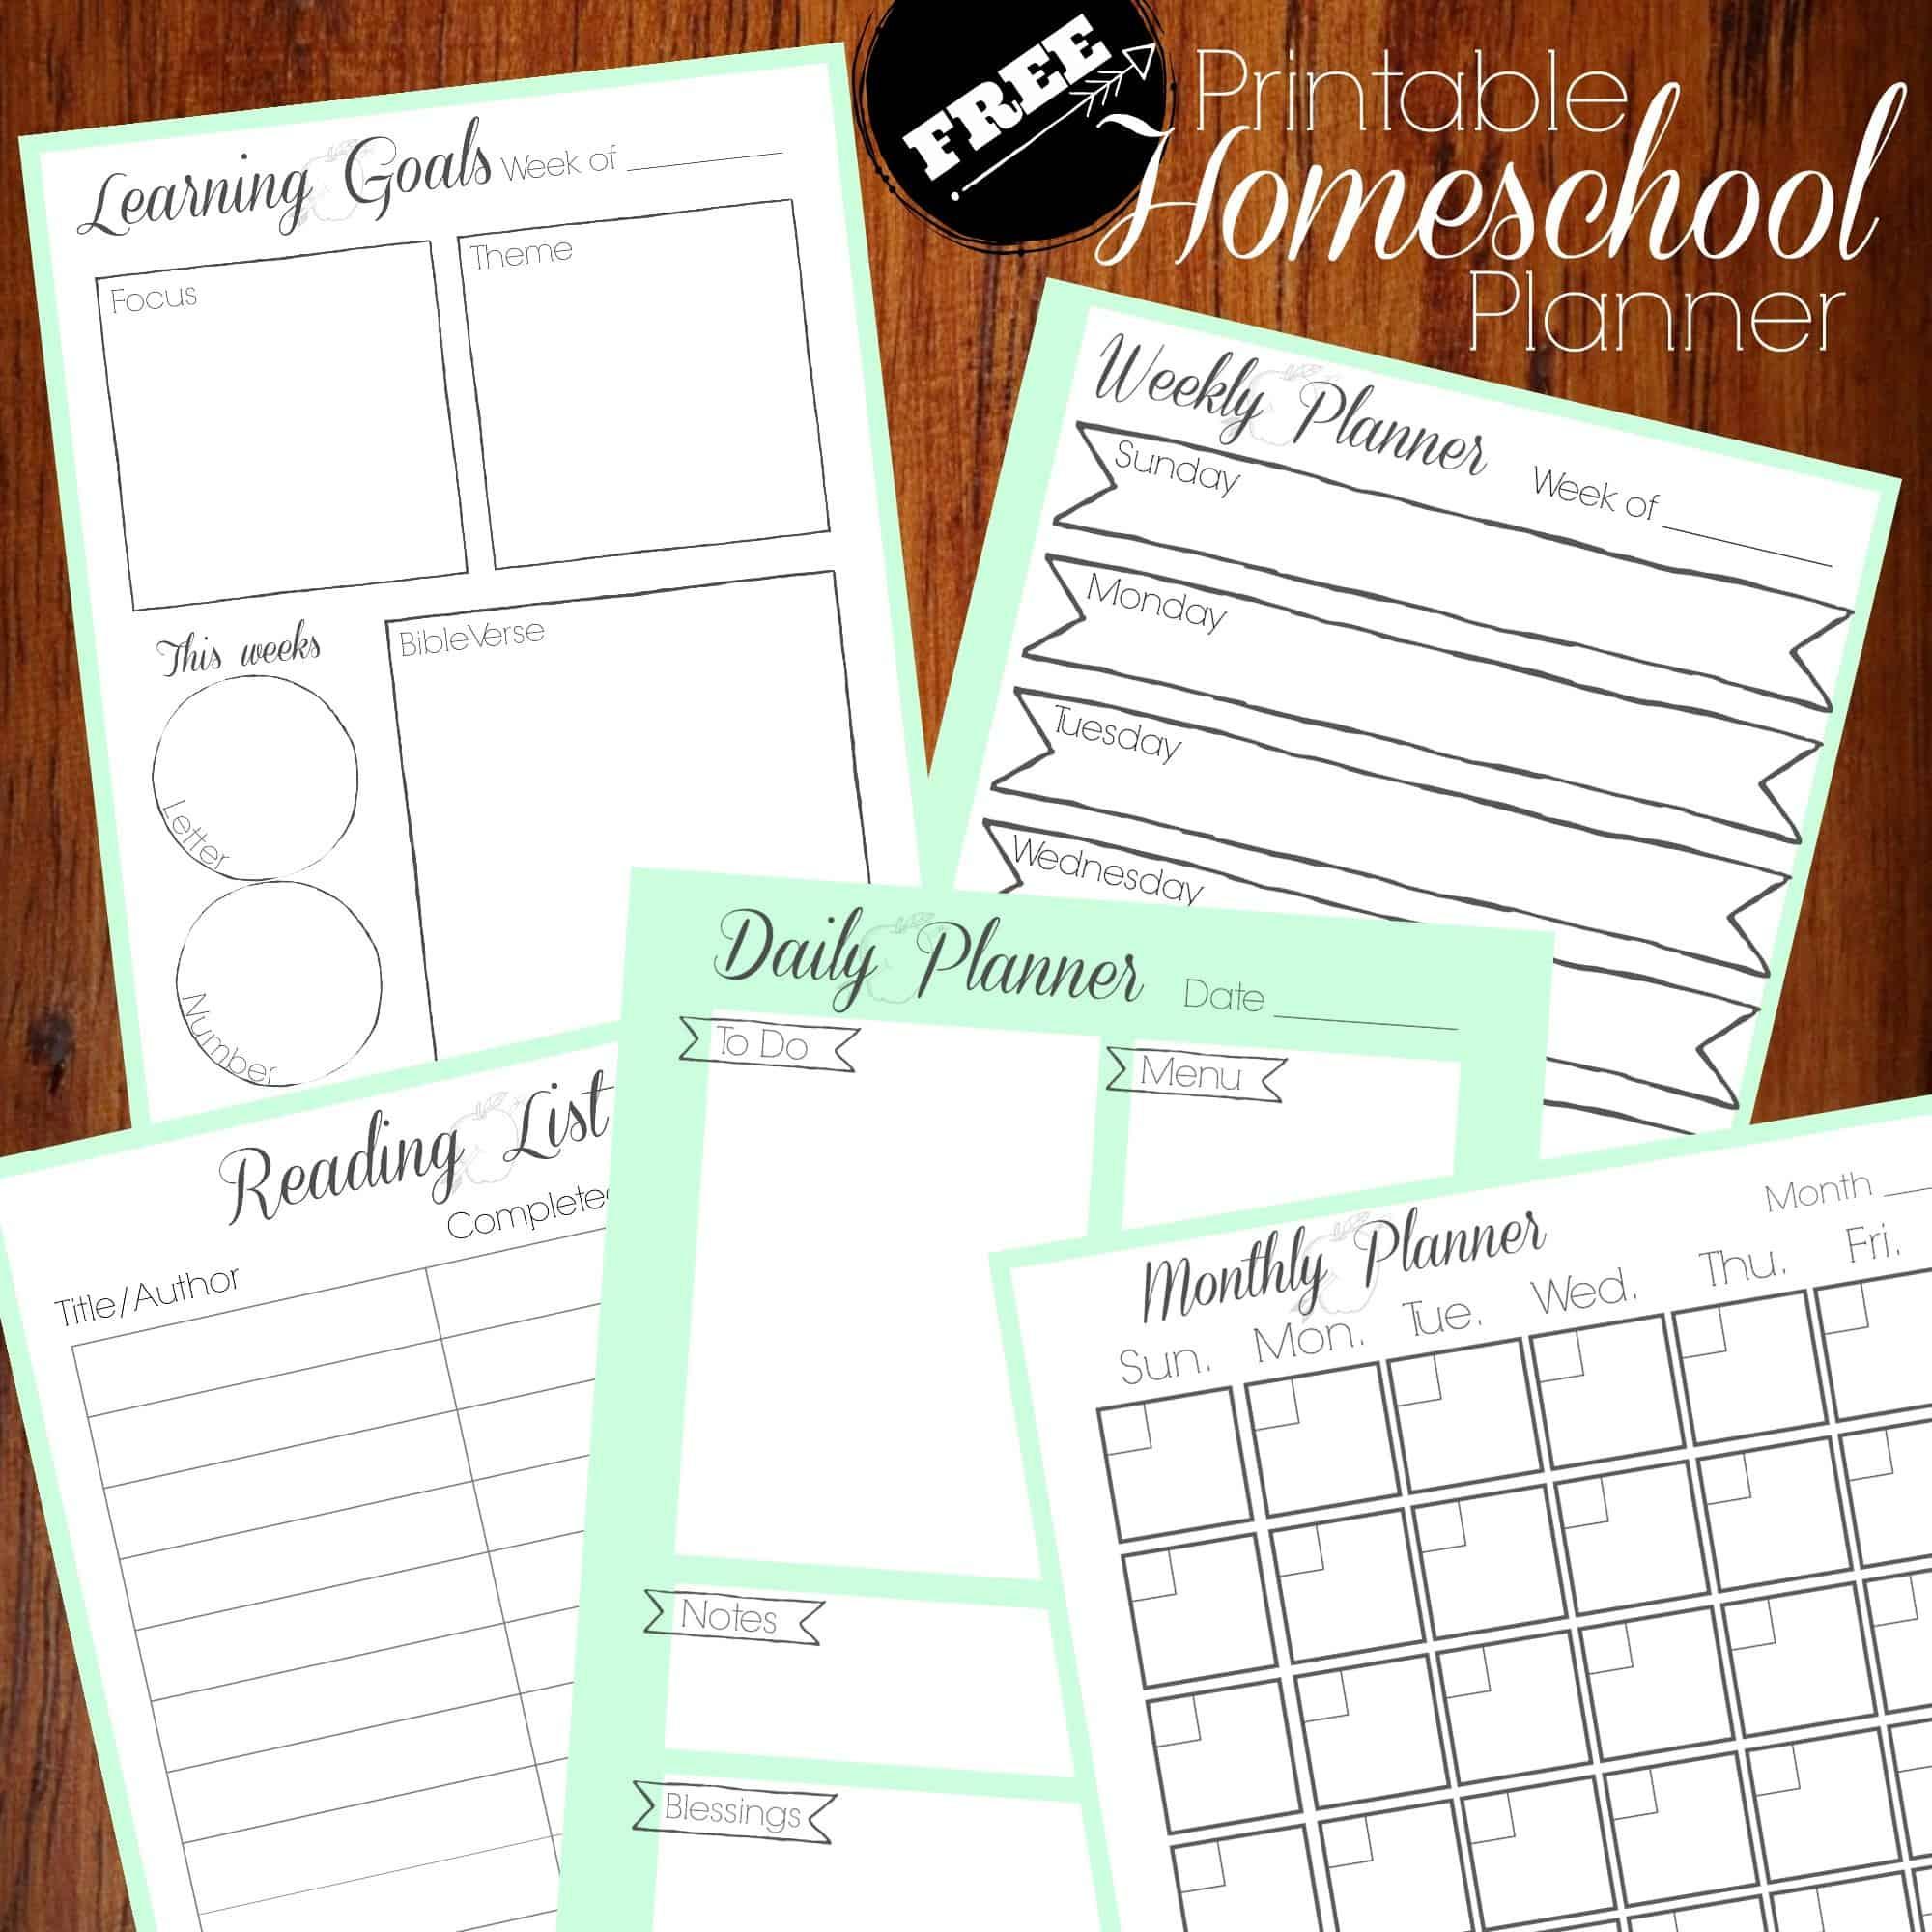 photo regarding Free Homeschool Planner Printable known as Absolutely free Homeschool Planner - Homeschool Printables for Absolutely free